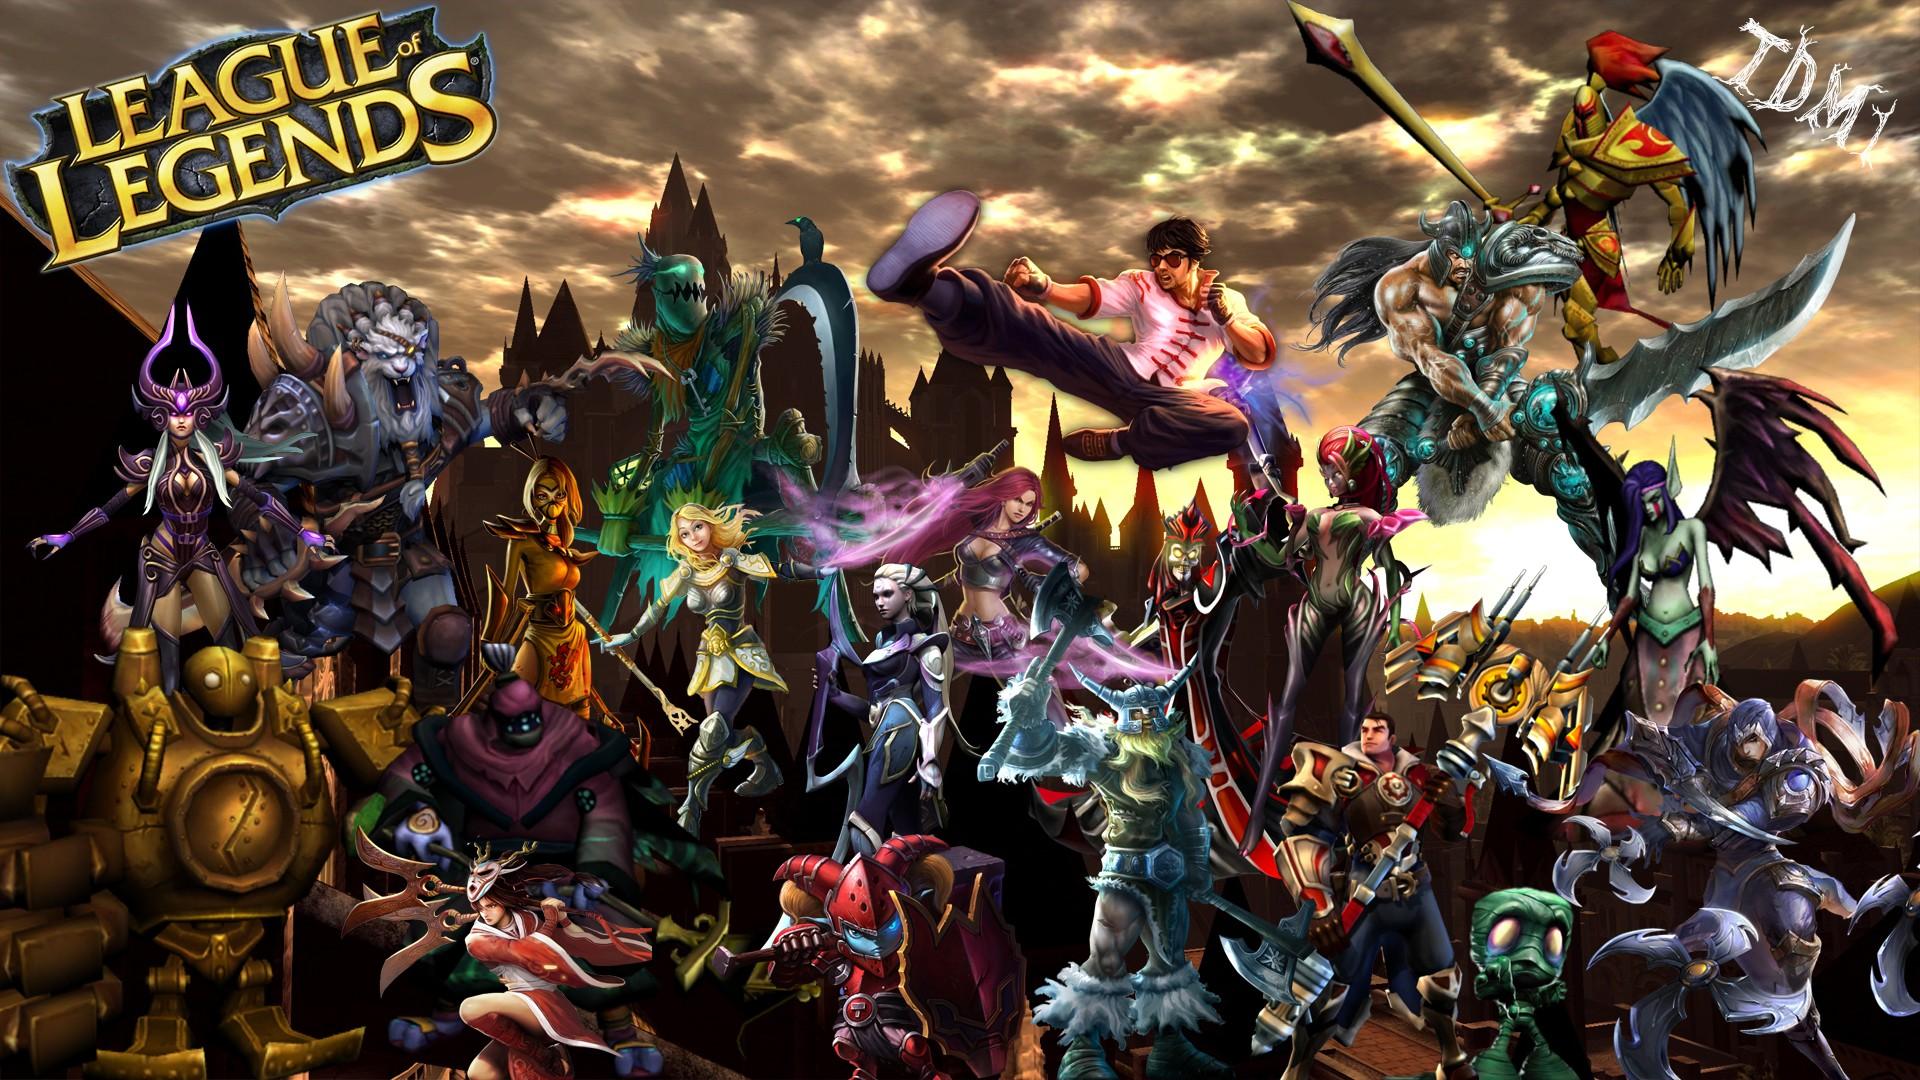 ... Wallpapers, League of Legends Chmpions Desktop Wallpapers, League of